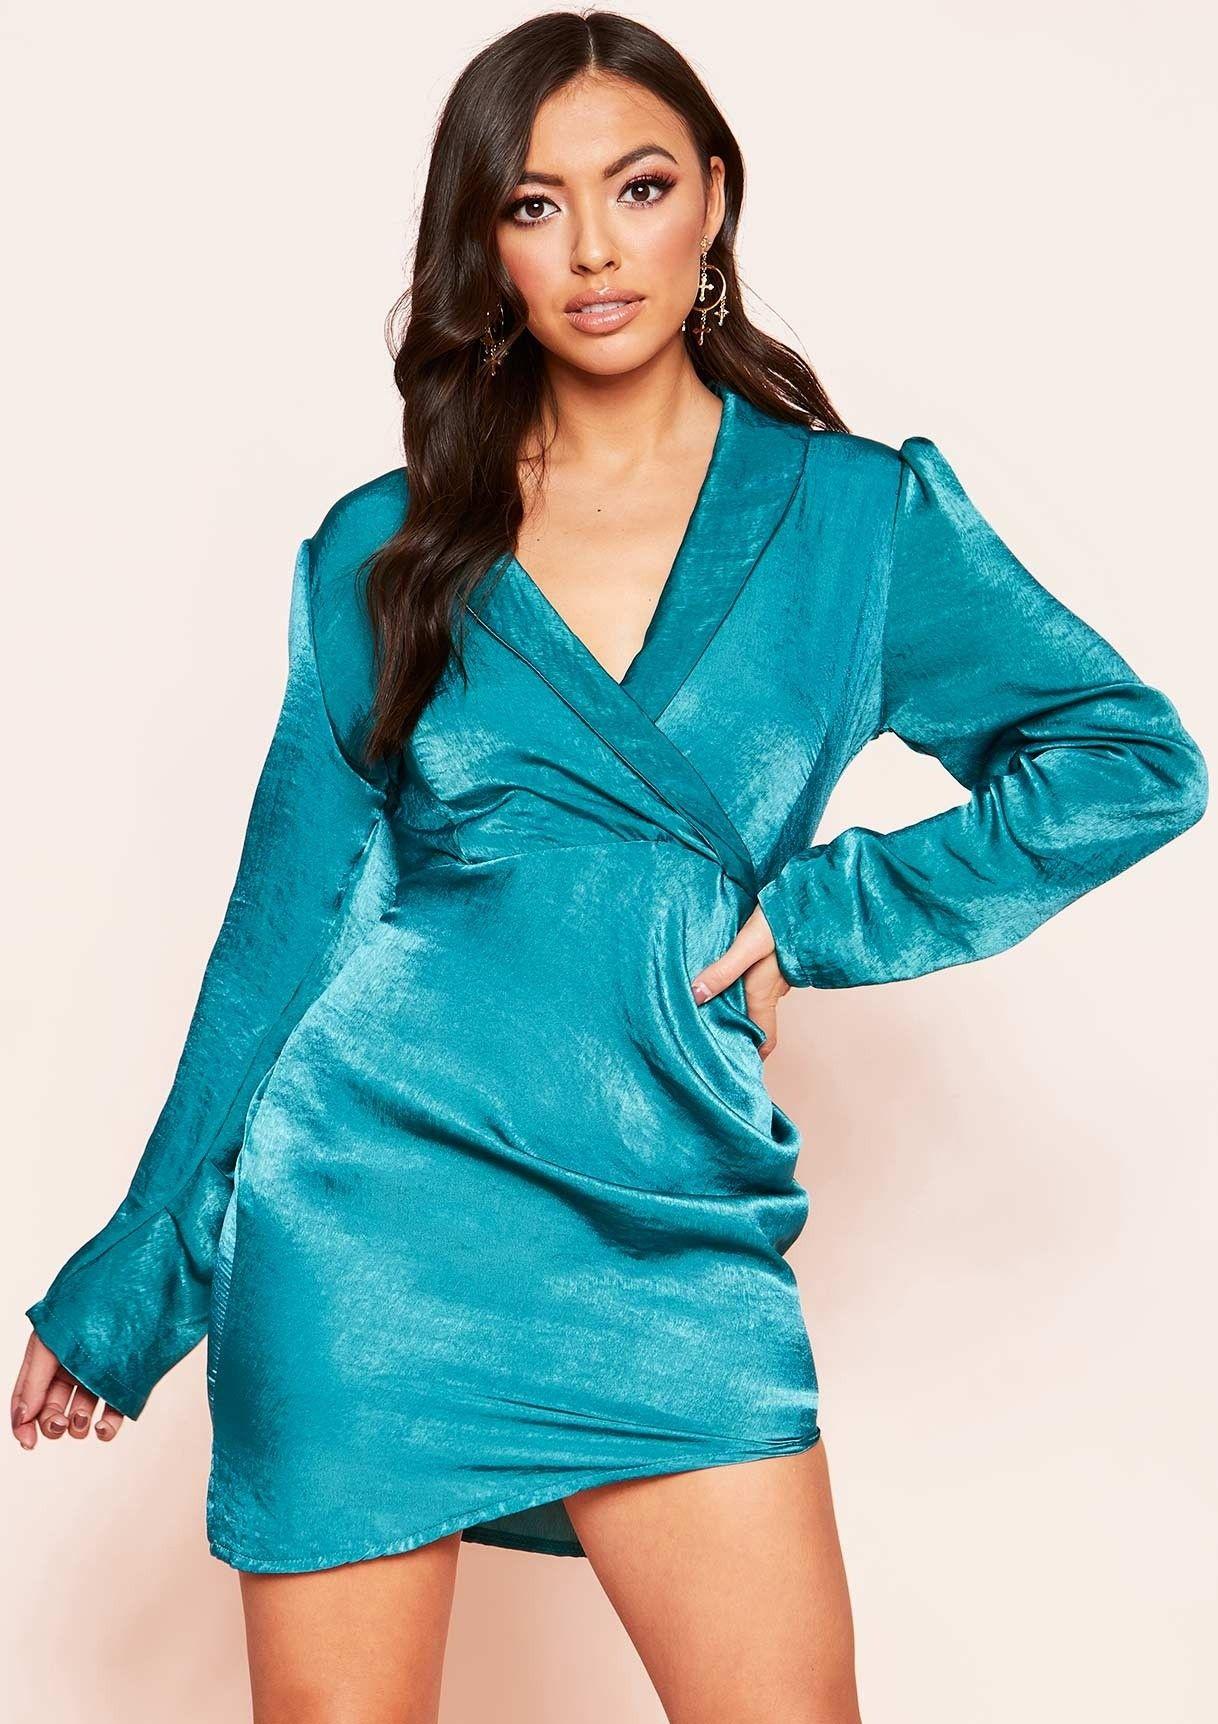 Missyempire - Izzy Teal Wrap Neckline Ruched Mini Dress 51f0e198b